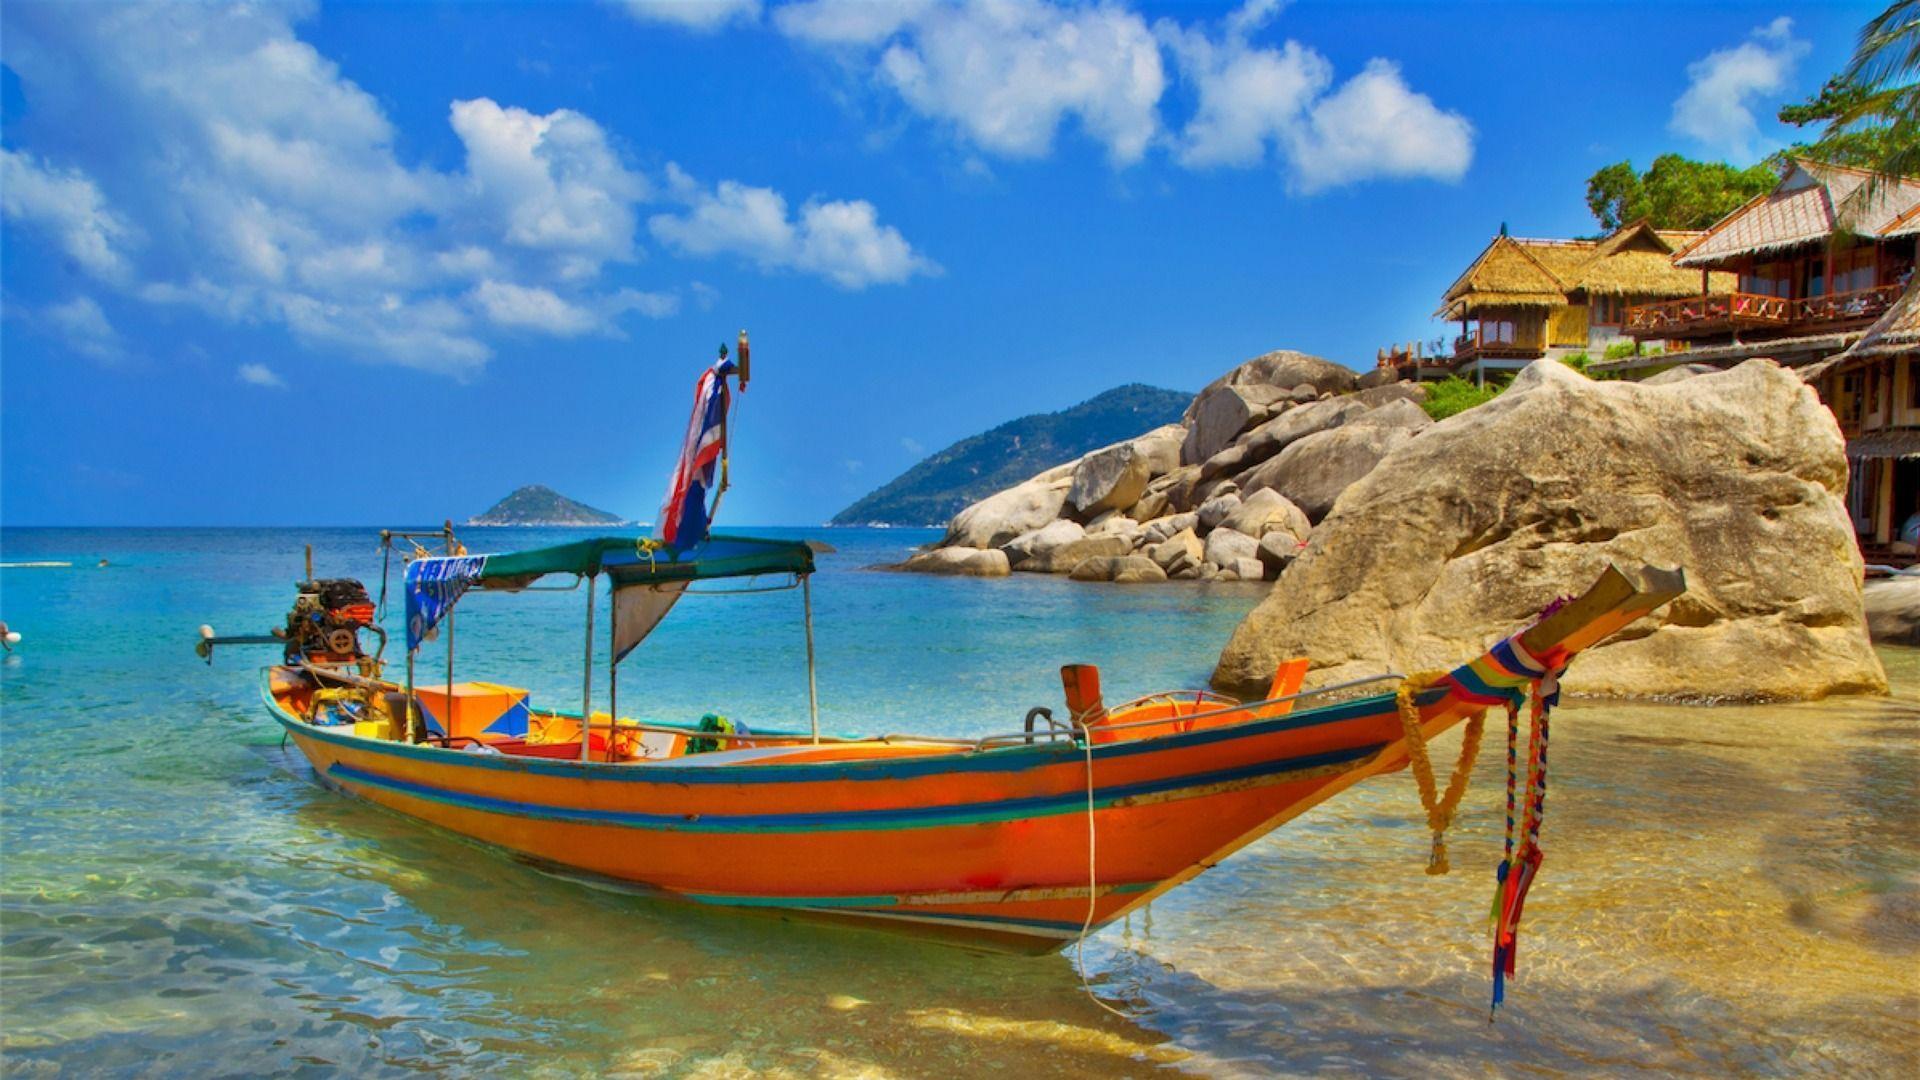 Boat Desktop Wallpapers Top Free Boat Desktop Backgrounds